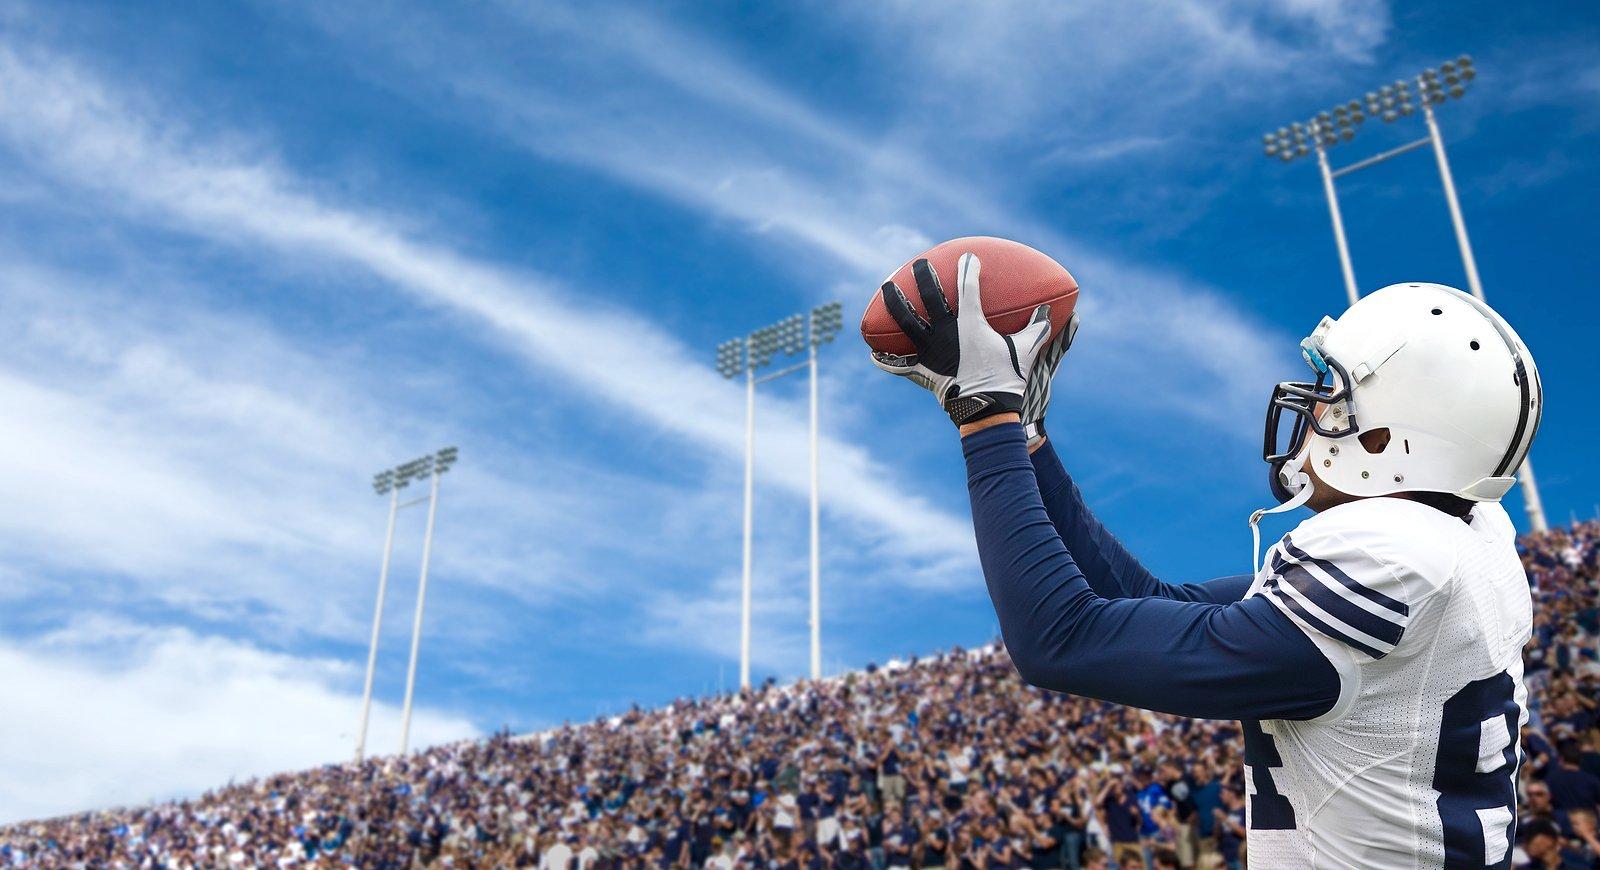 bigstock-Football-Player-catching-a-tou-22198955